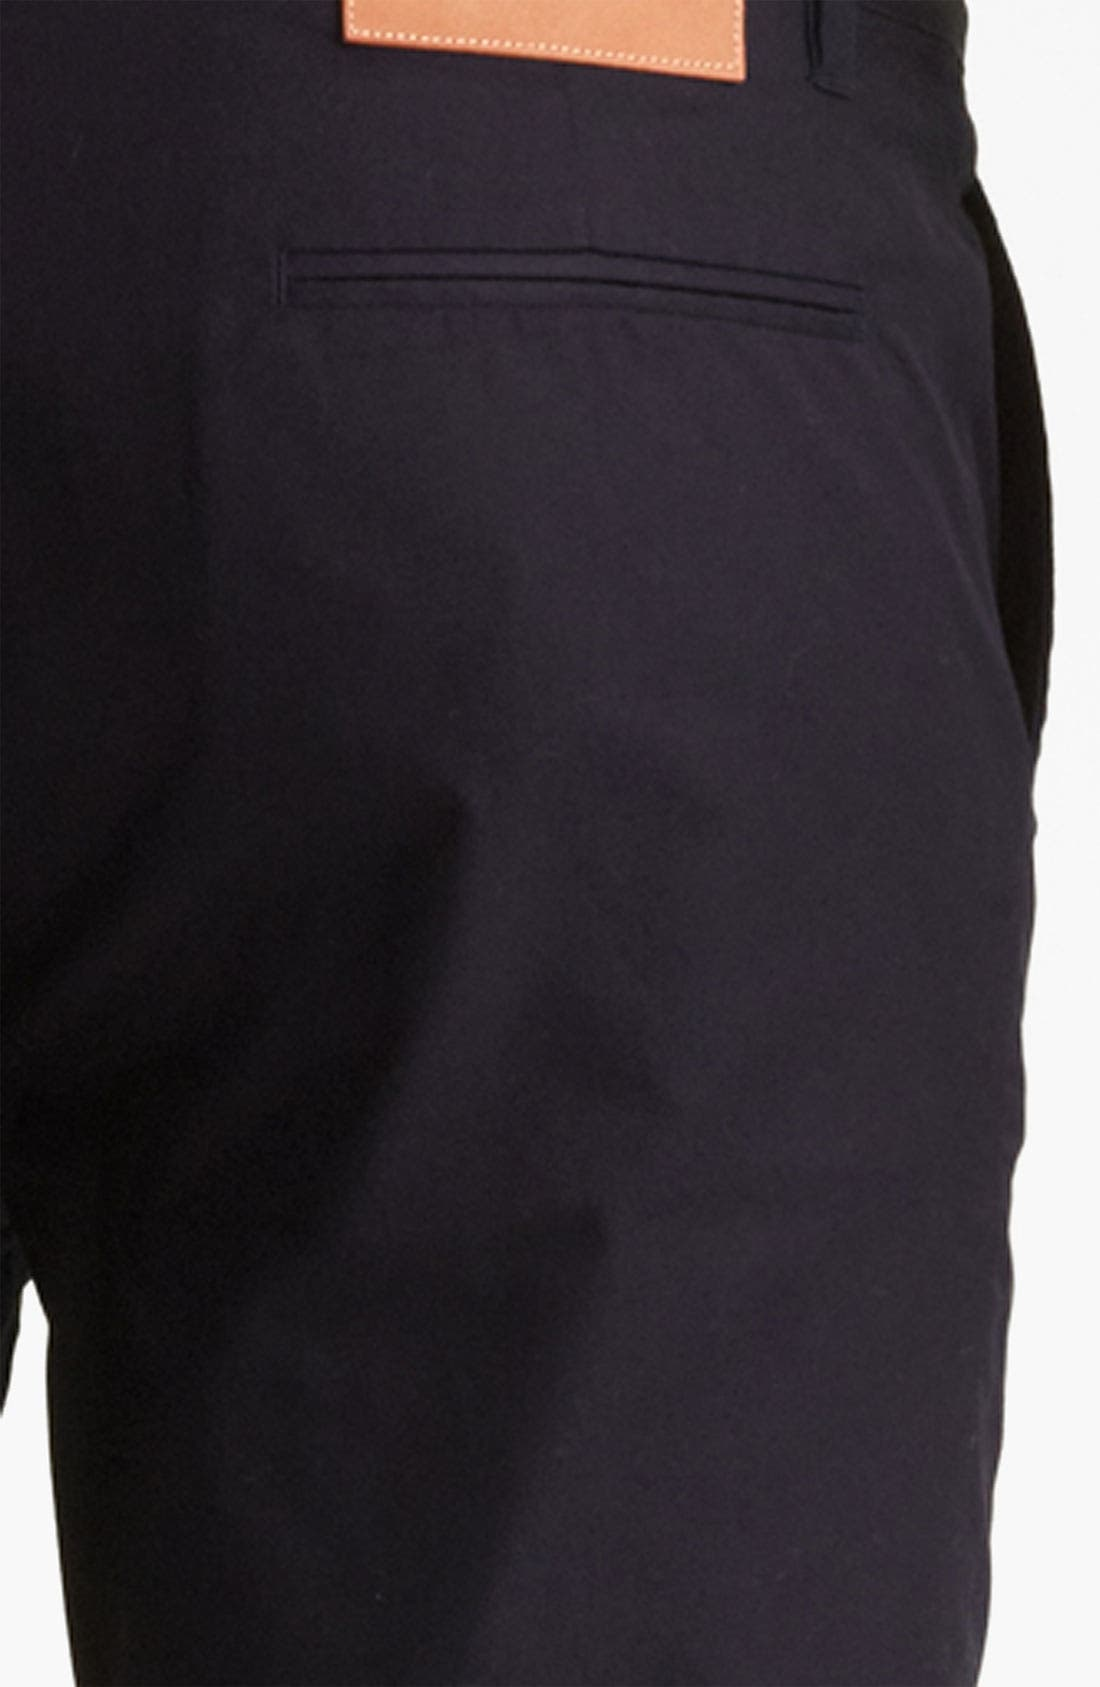 Alternate Image 3  - Shipley & Halmos 'Belmont' Slim Fit Cotton Pants